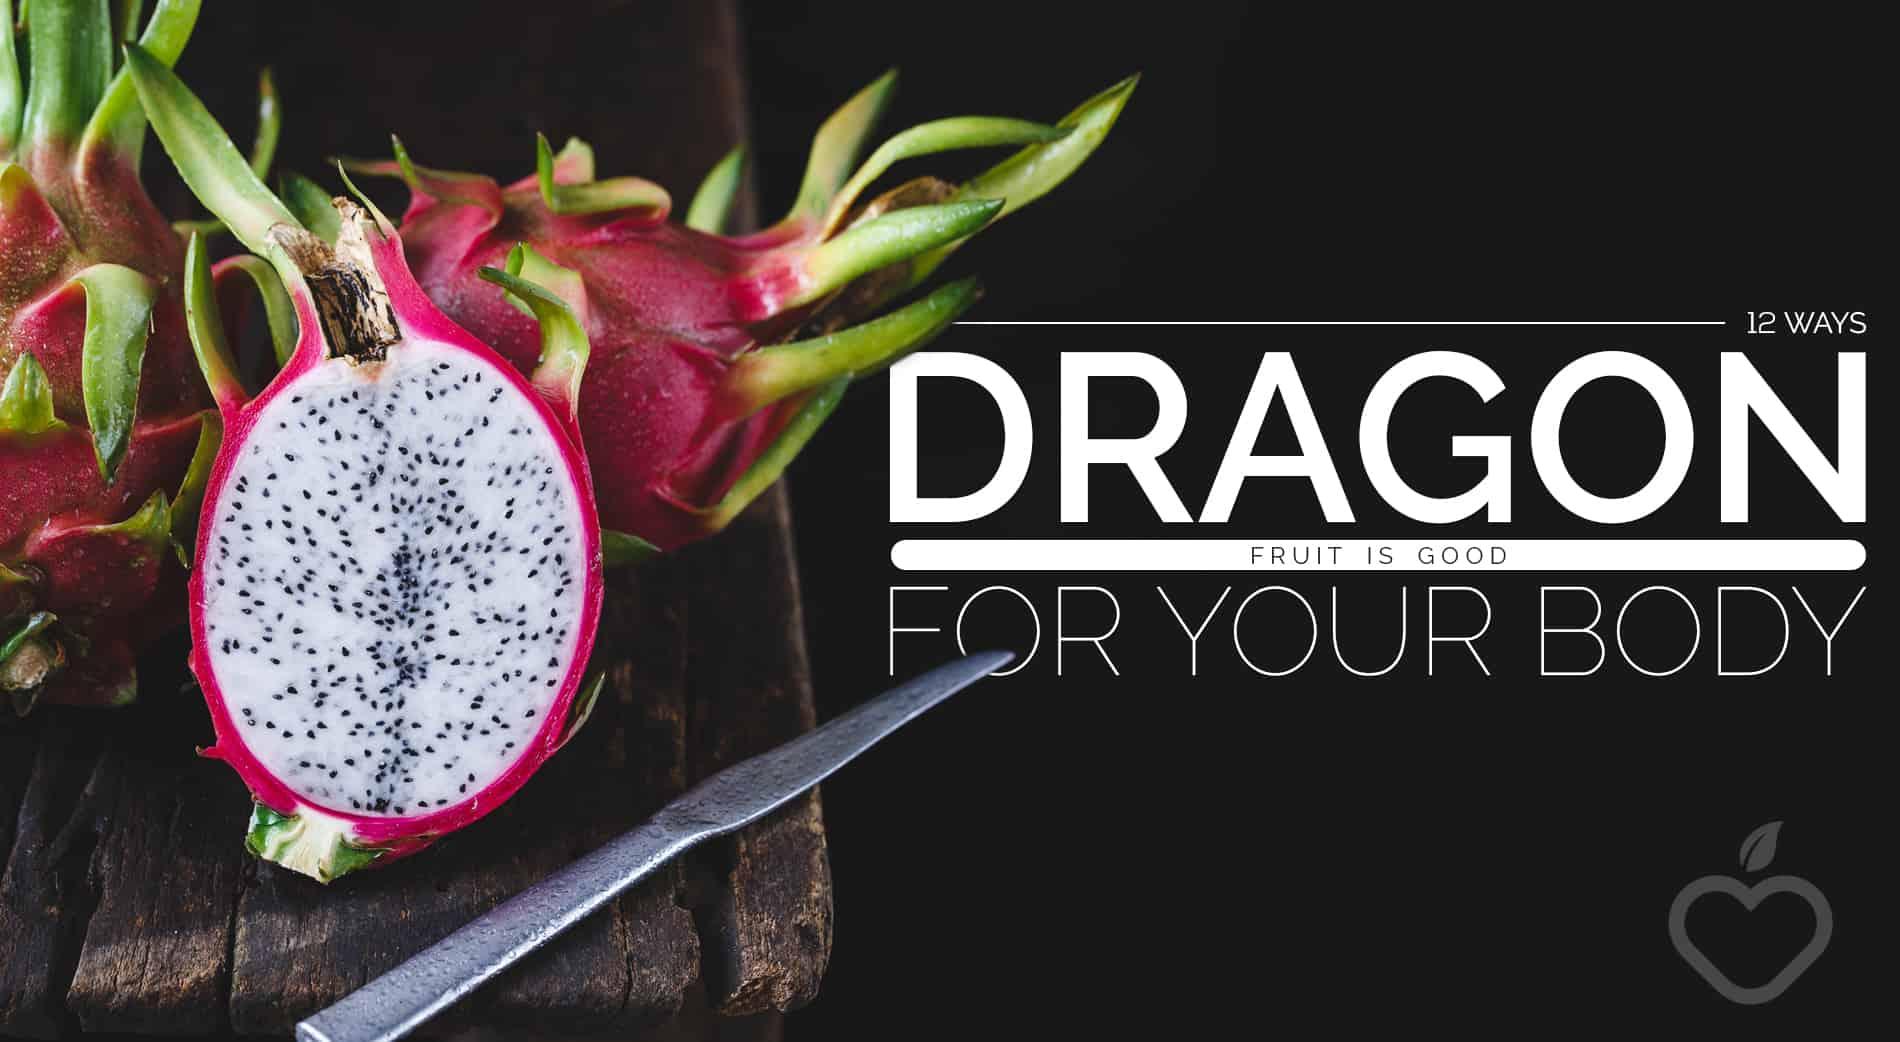 Dragon Fruit Image Design 1 - 12 Methods Dragon Fruit is Good for Your Physique